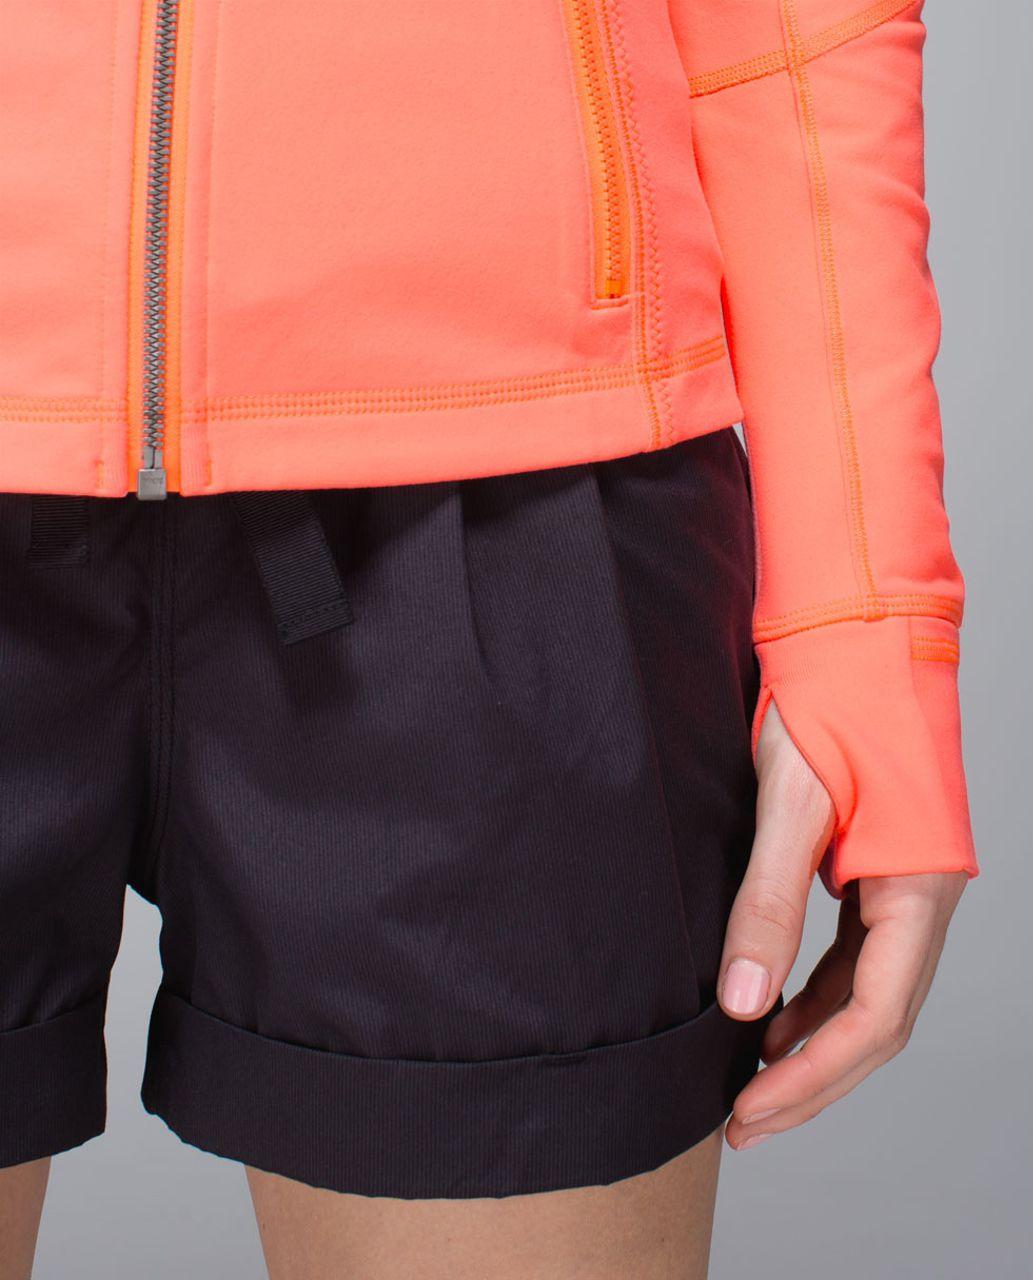 Lululemon Forme Jacket *Cuffins - Very Light Flare